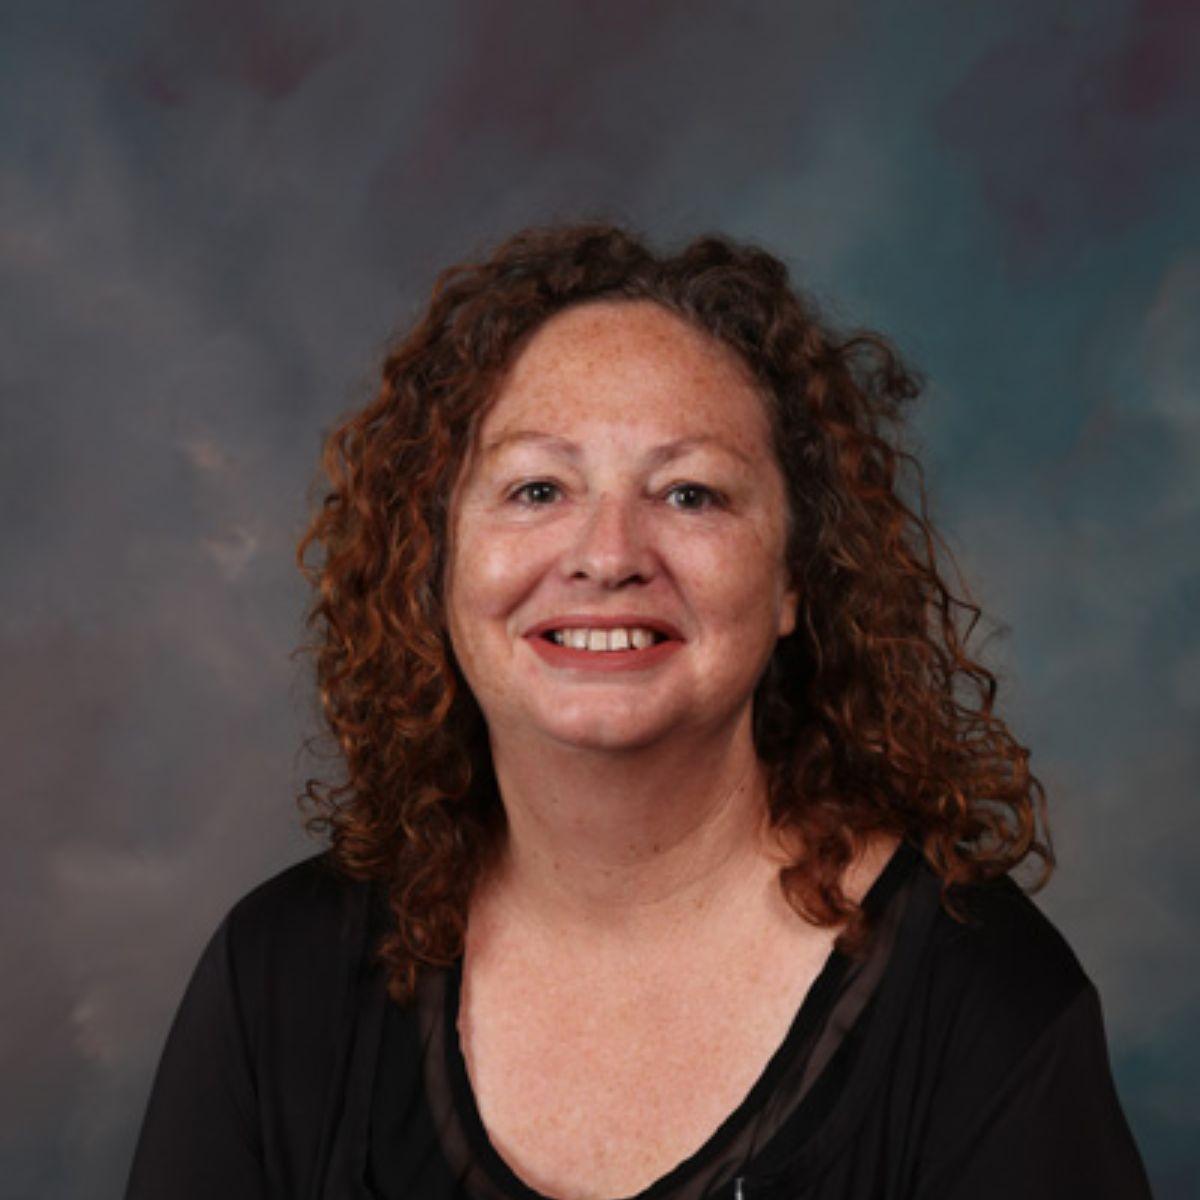 Ms R. Davis